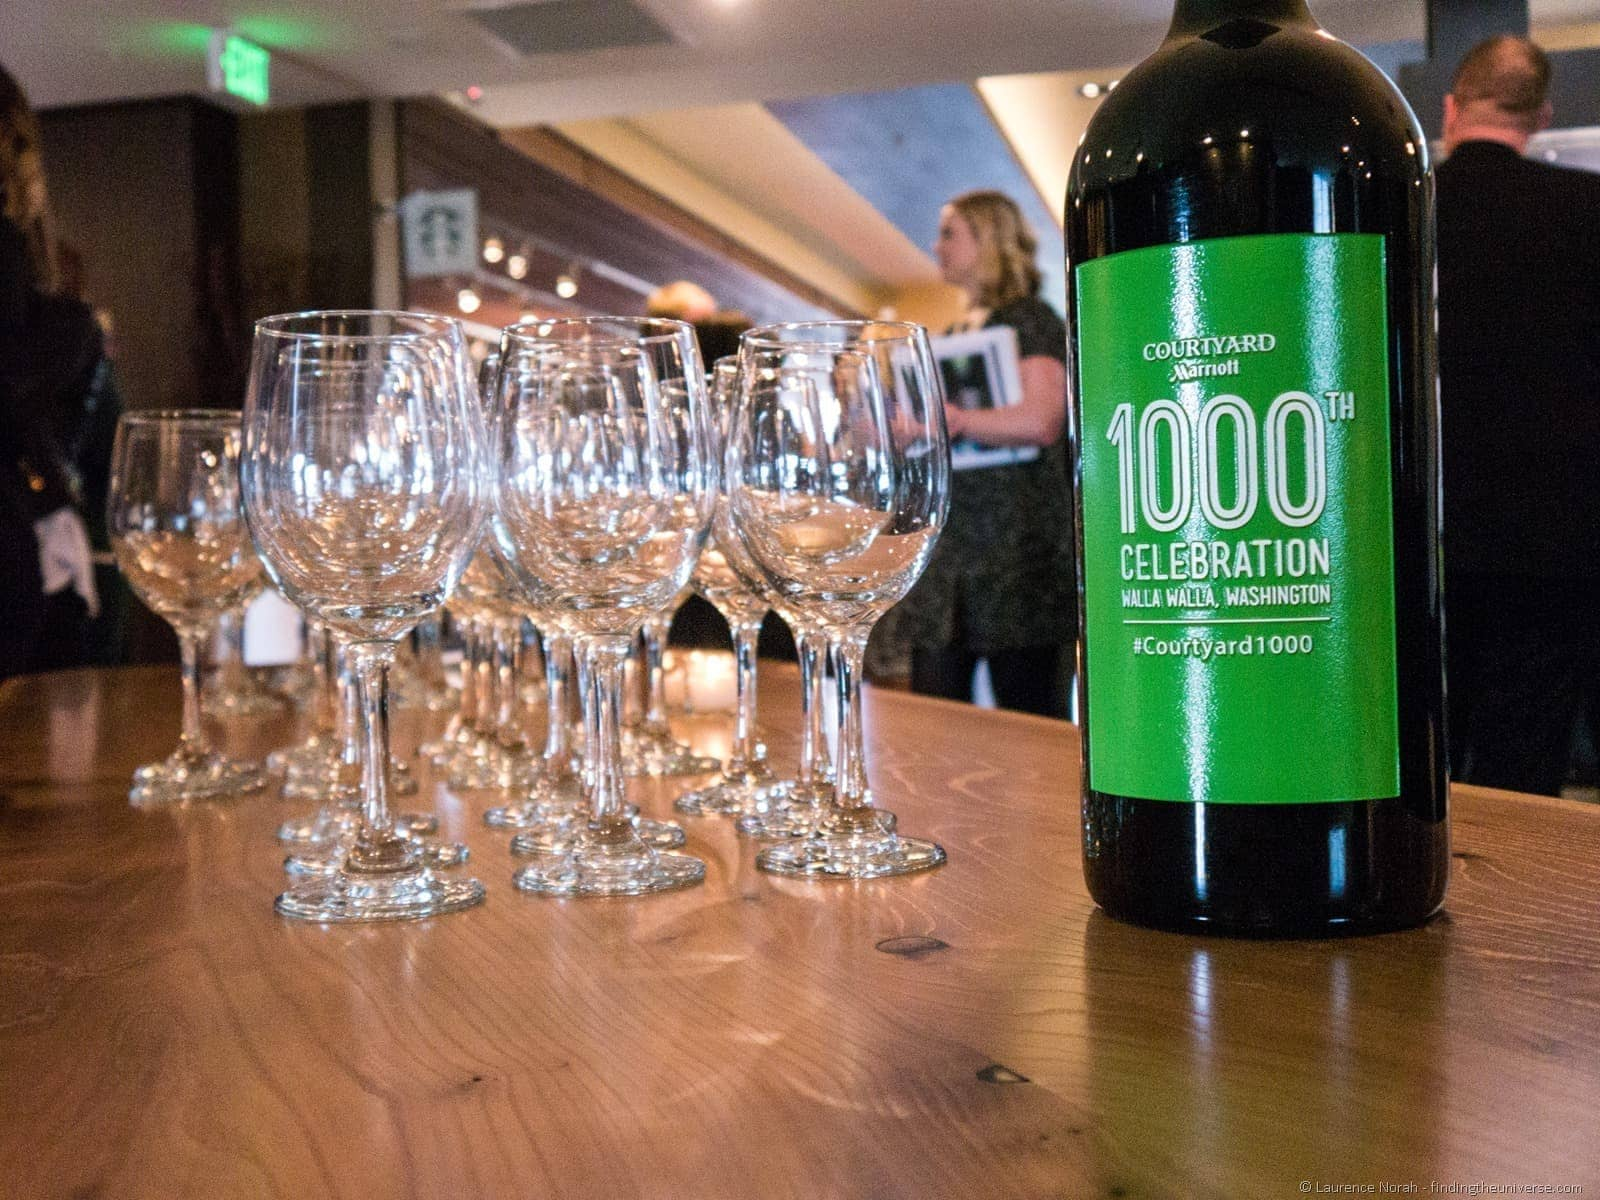 1000th marriott celebration wine